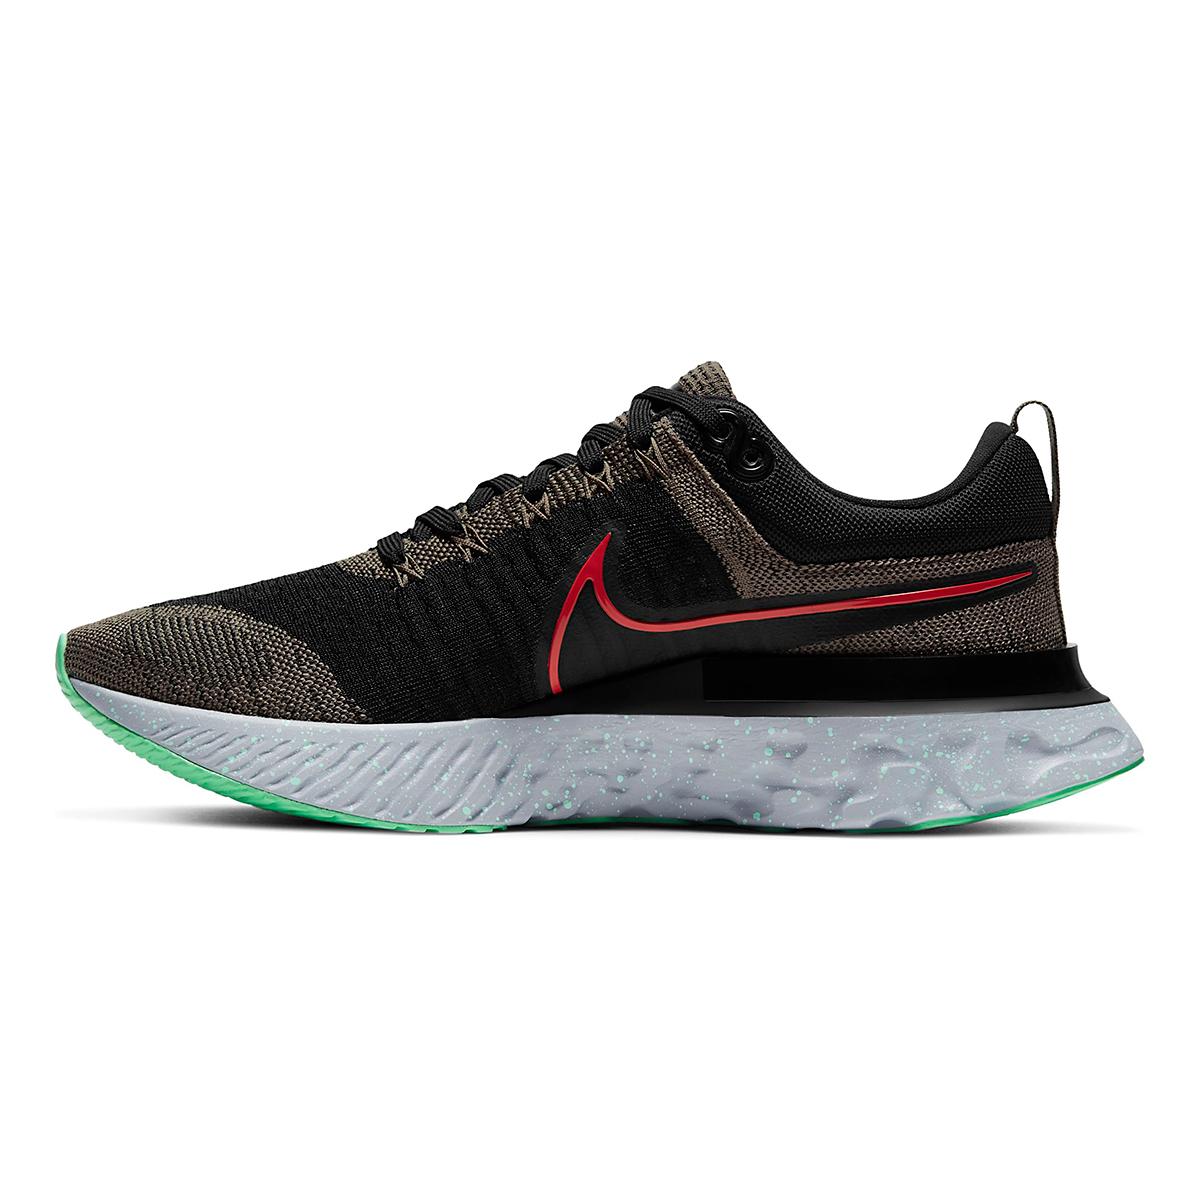 Men's Nike React Infinity Run Flyknit 2 Running Shoe - Color: Ridgerock/Chile Red/Black/Green Glow - Size: 6 - Width: Regular, Ridgerock/Chile Red/Black/Green Glow, large, image 2